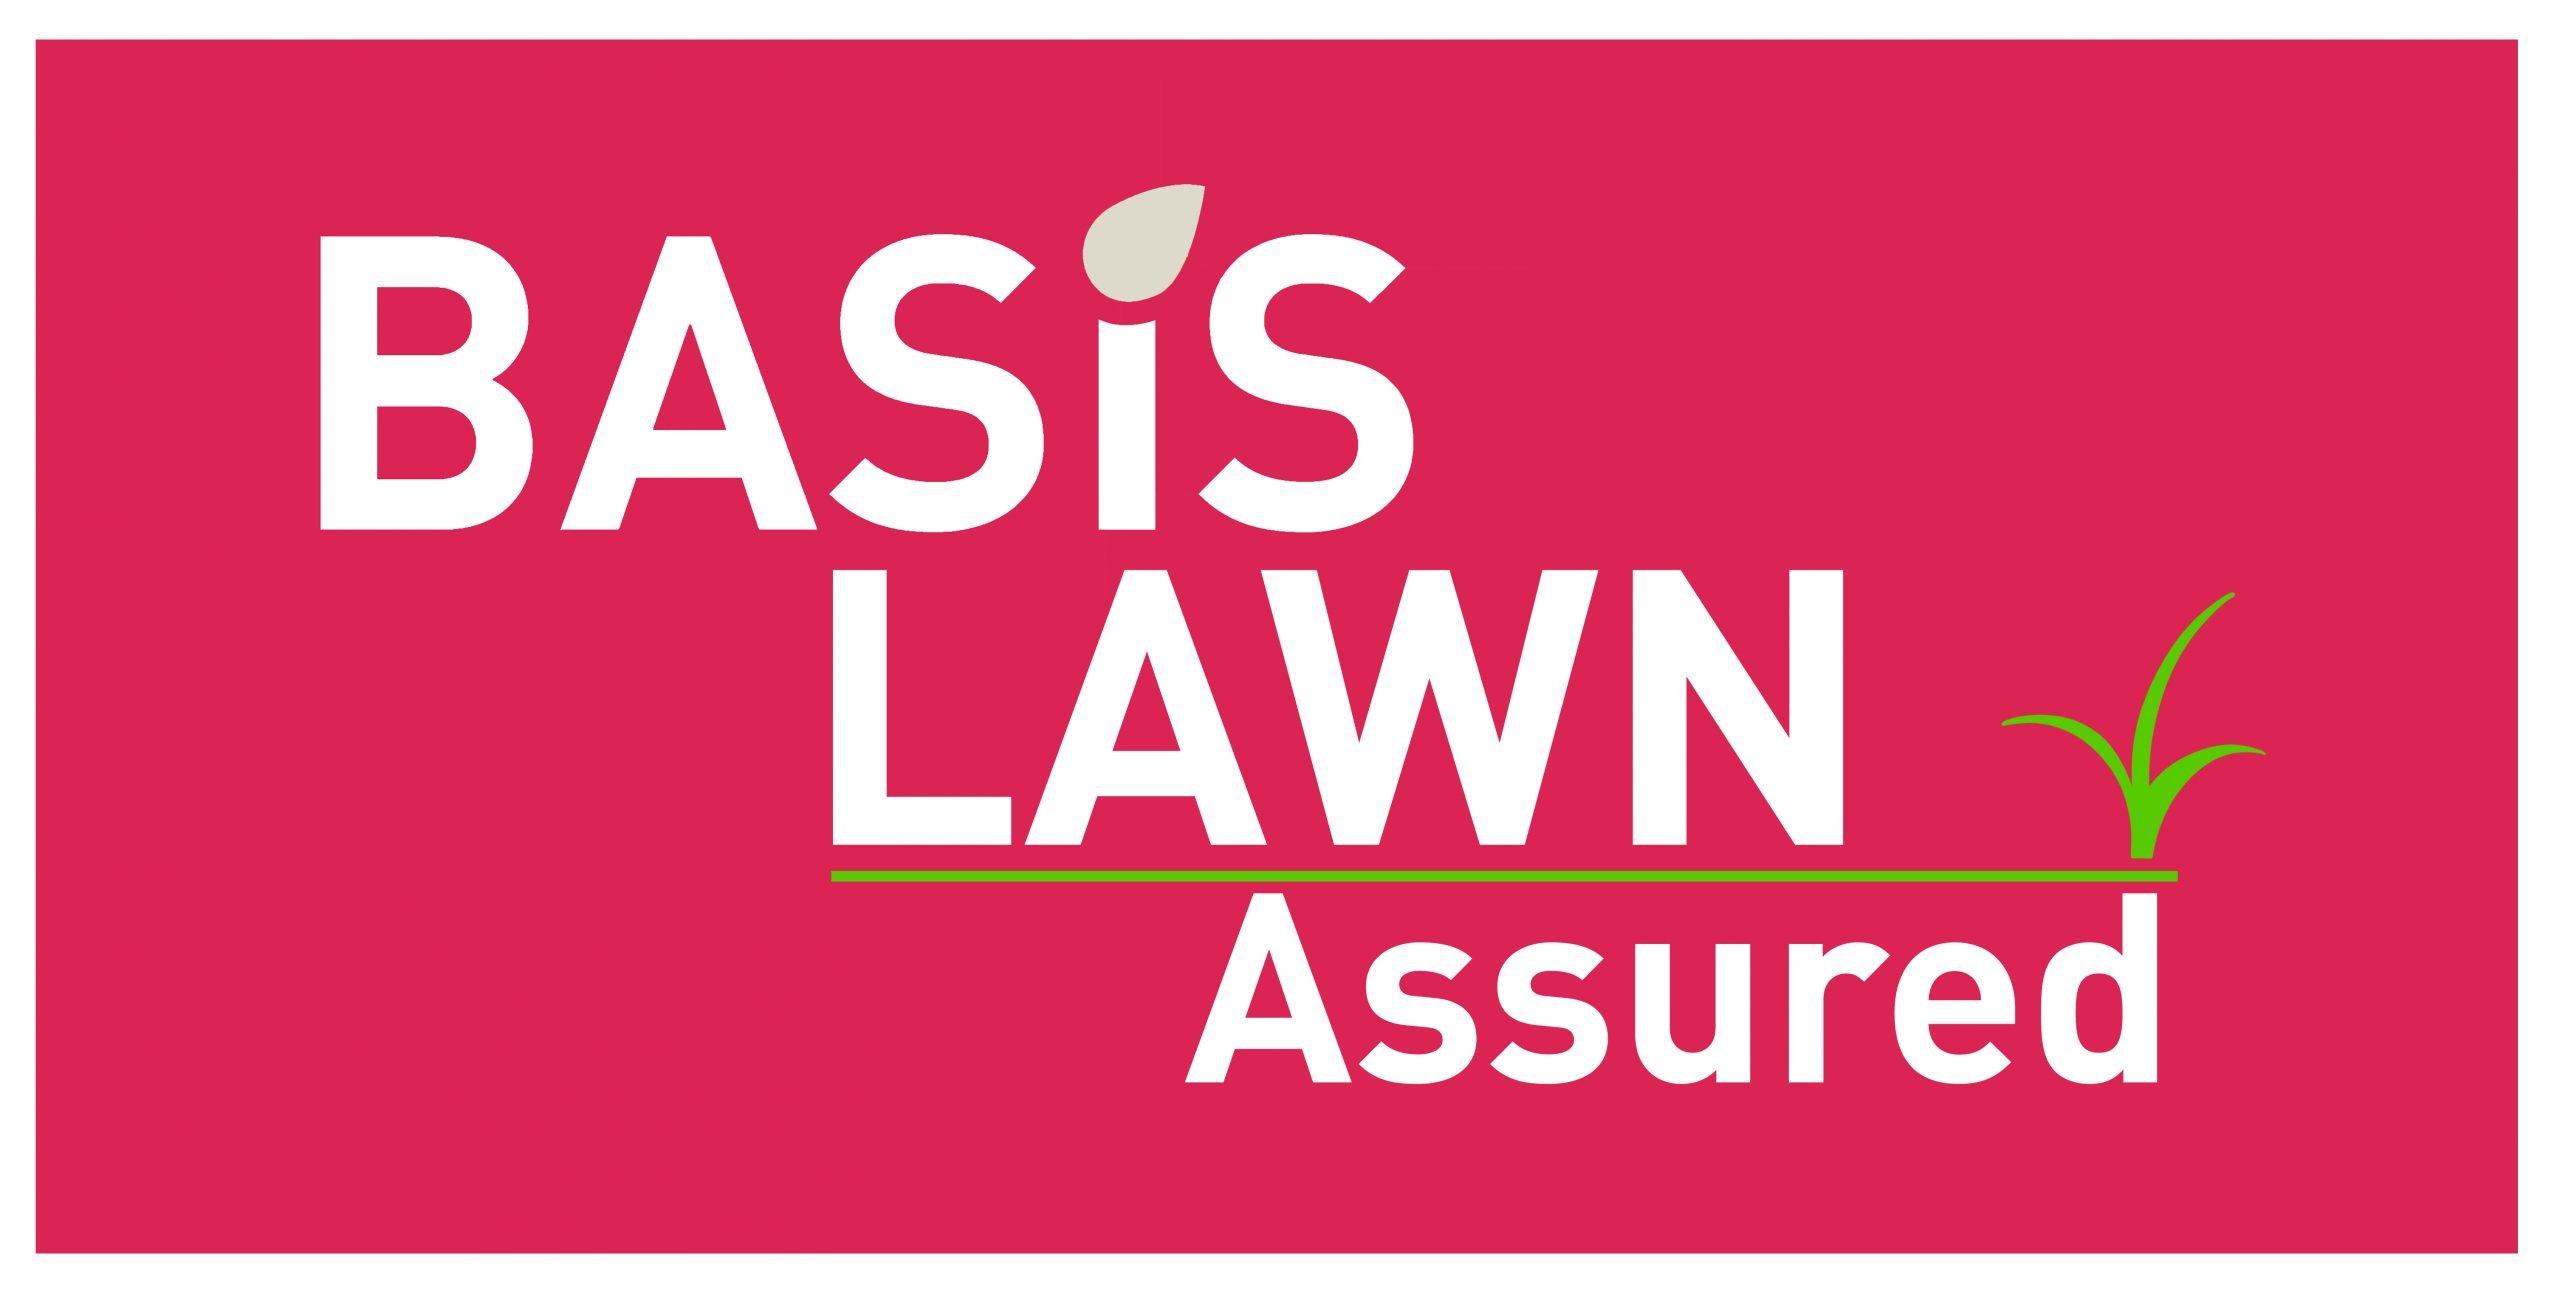 basis lawn assured logo new logo